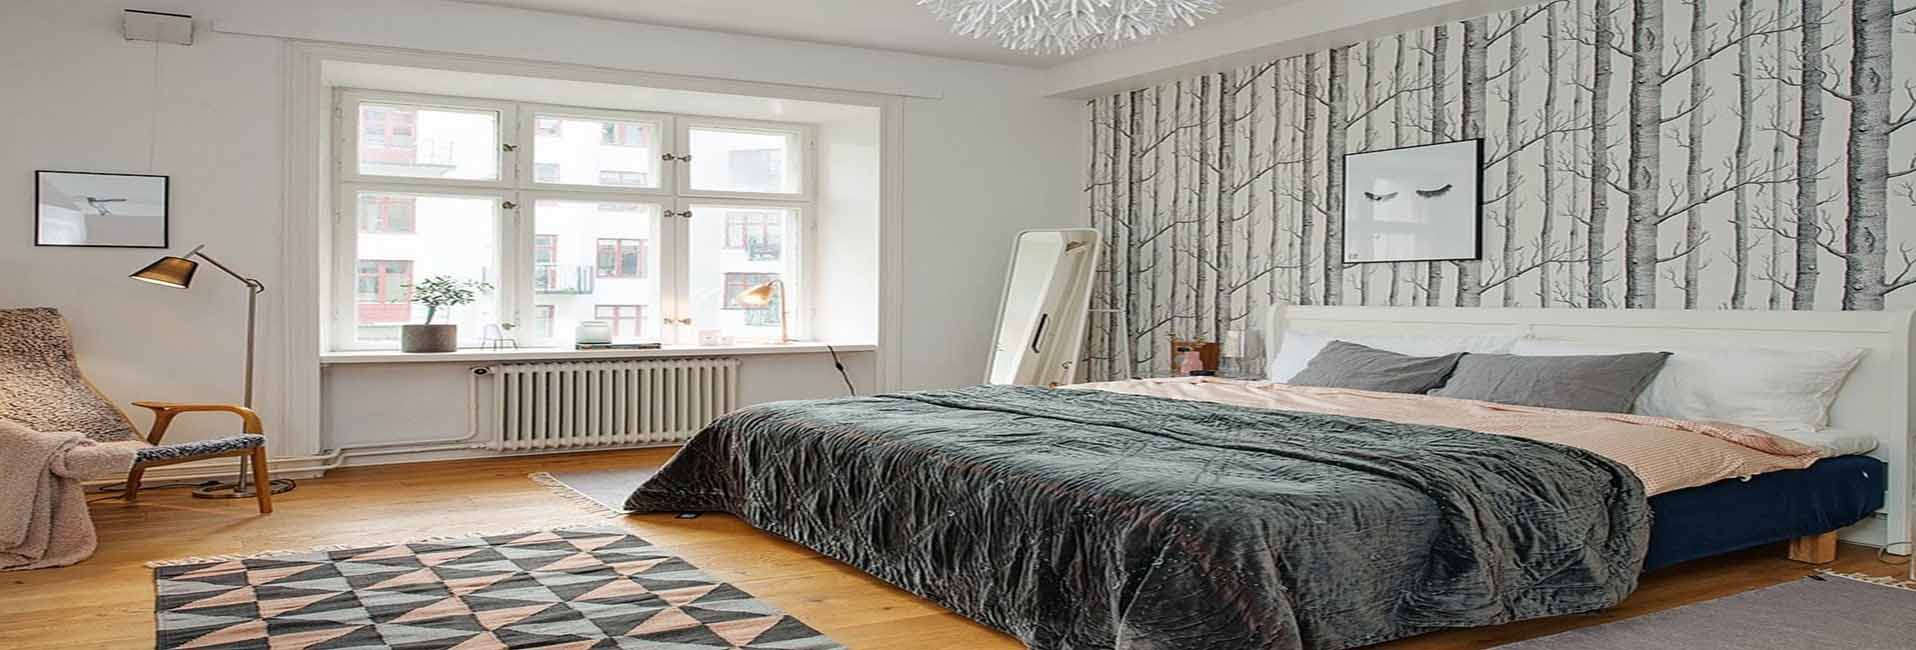 فني تركيب غرف نوم ايكيا بالدمام